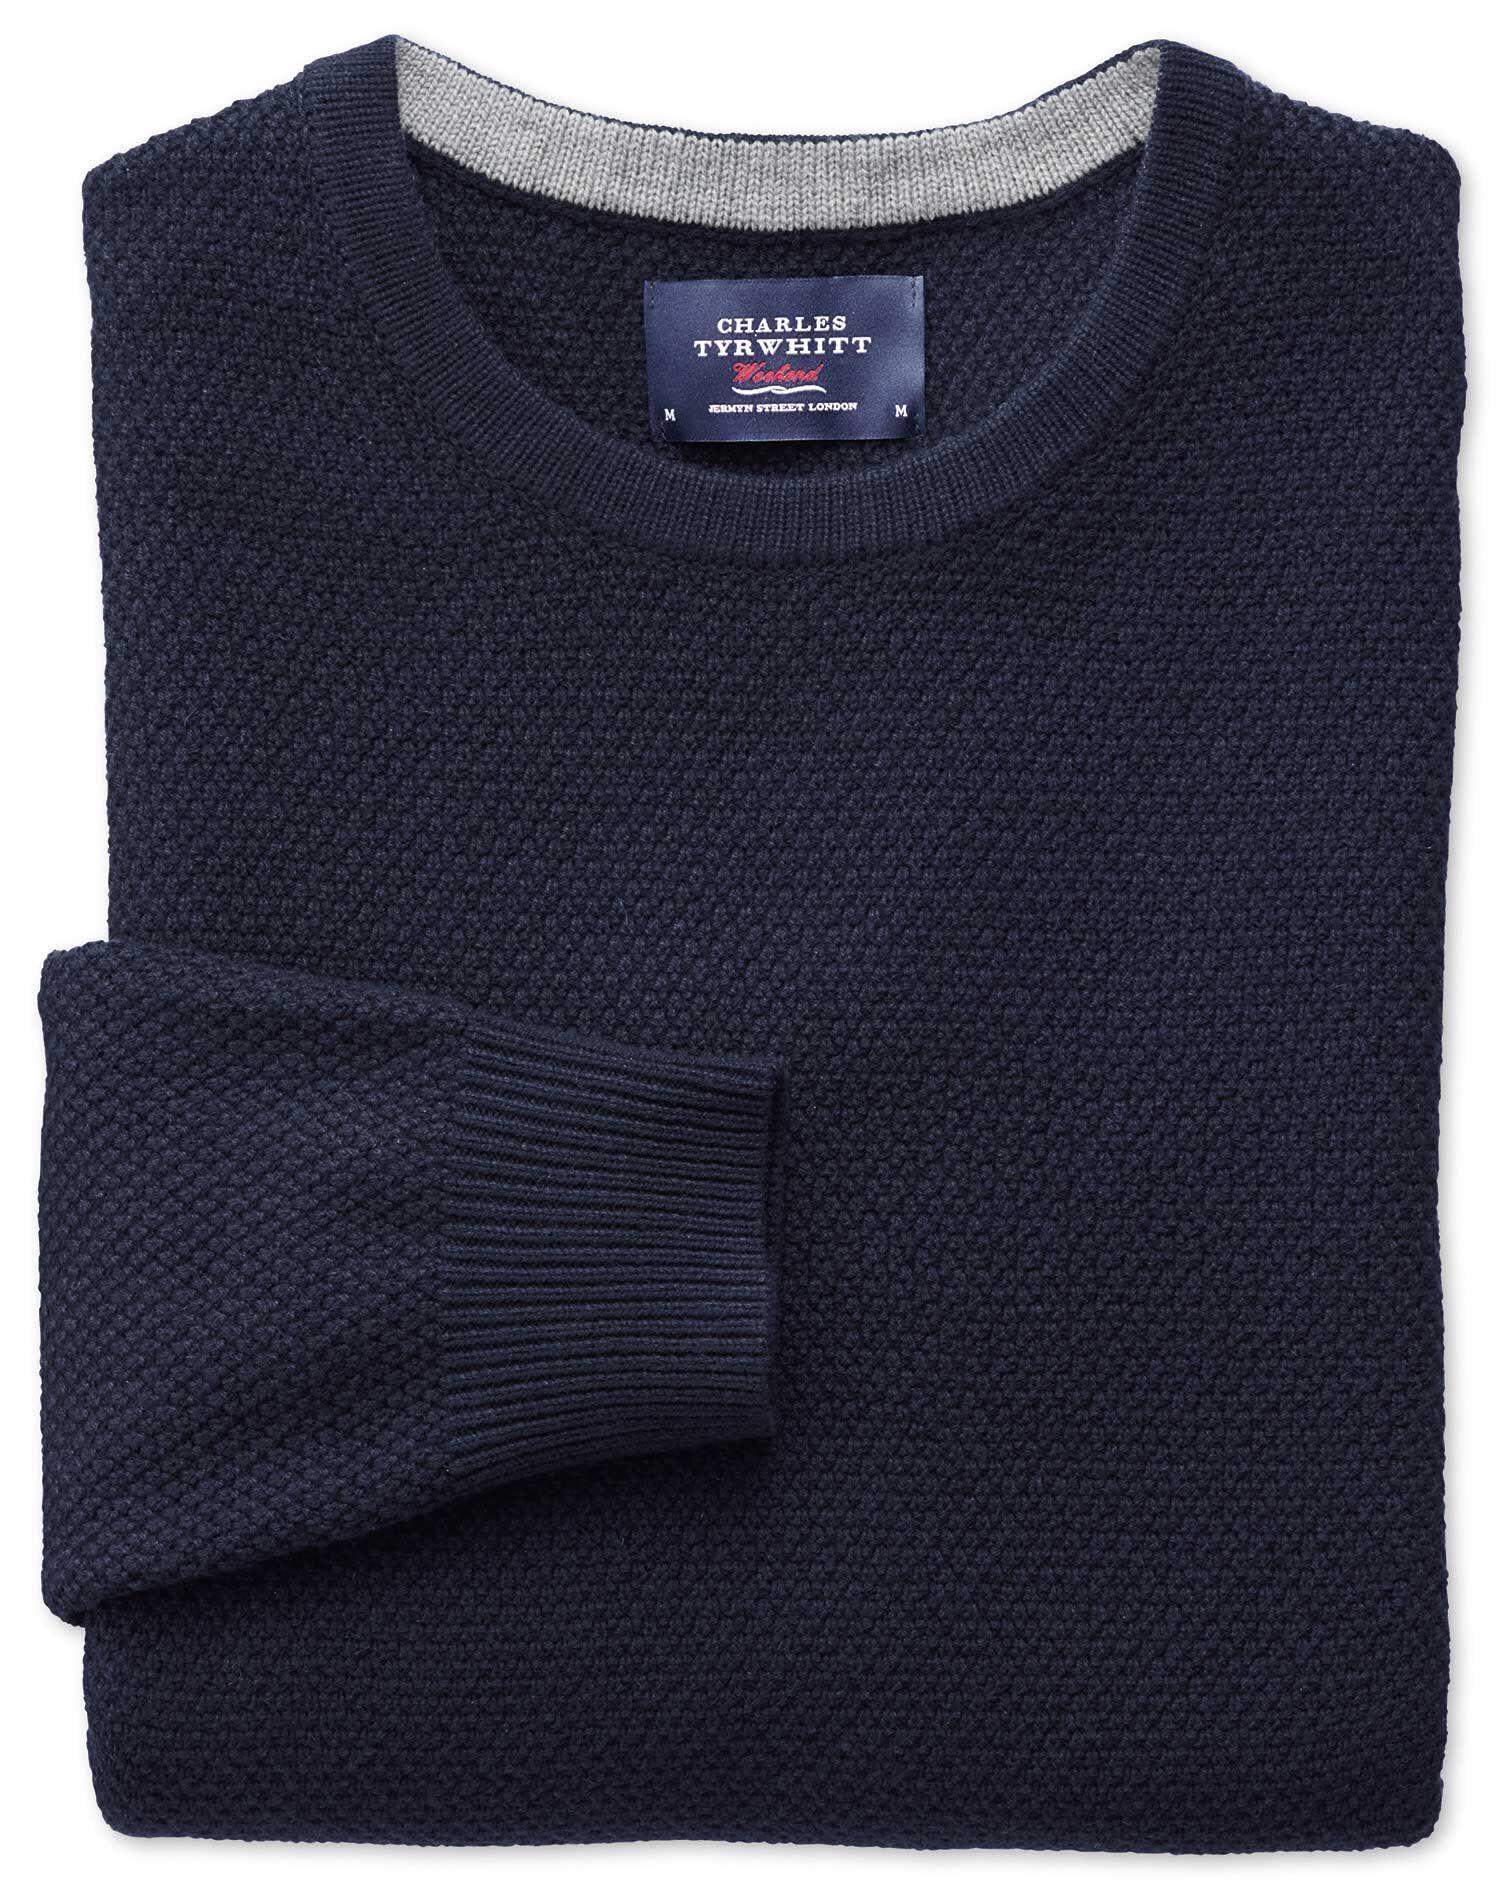 Navy Merino Cotton Crew Neck Wool Jumper Size XXXL by Charles Tyrwhitt